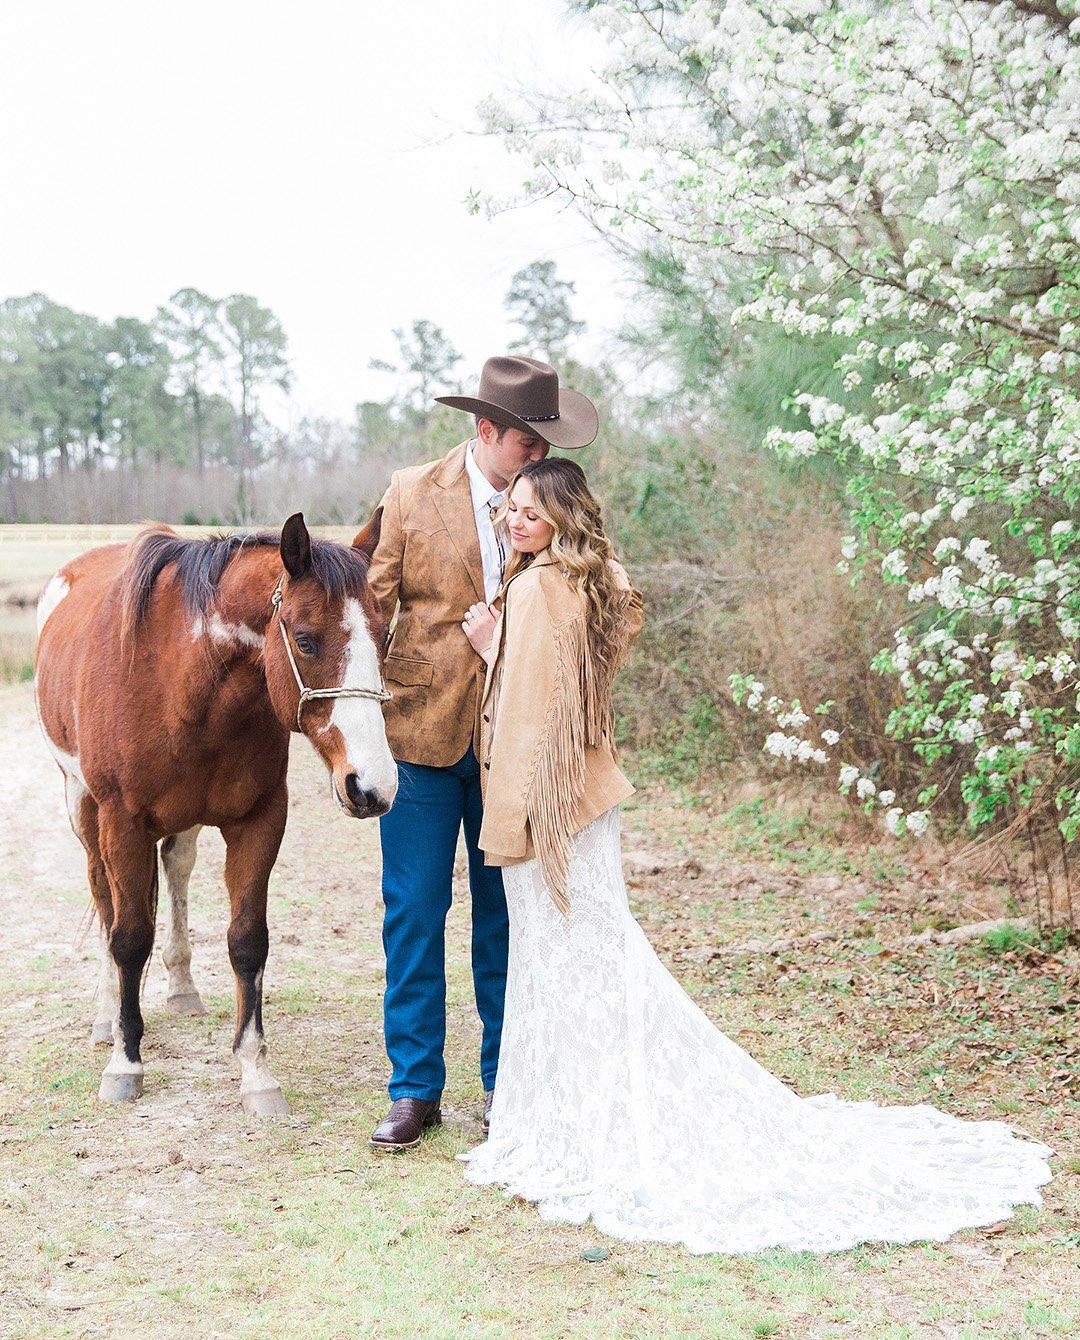 wedding-horse